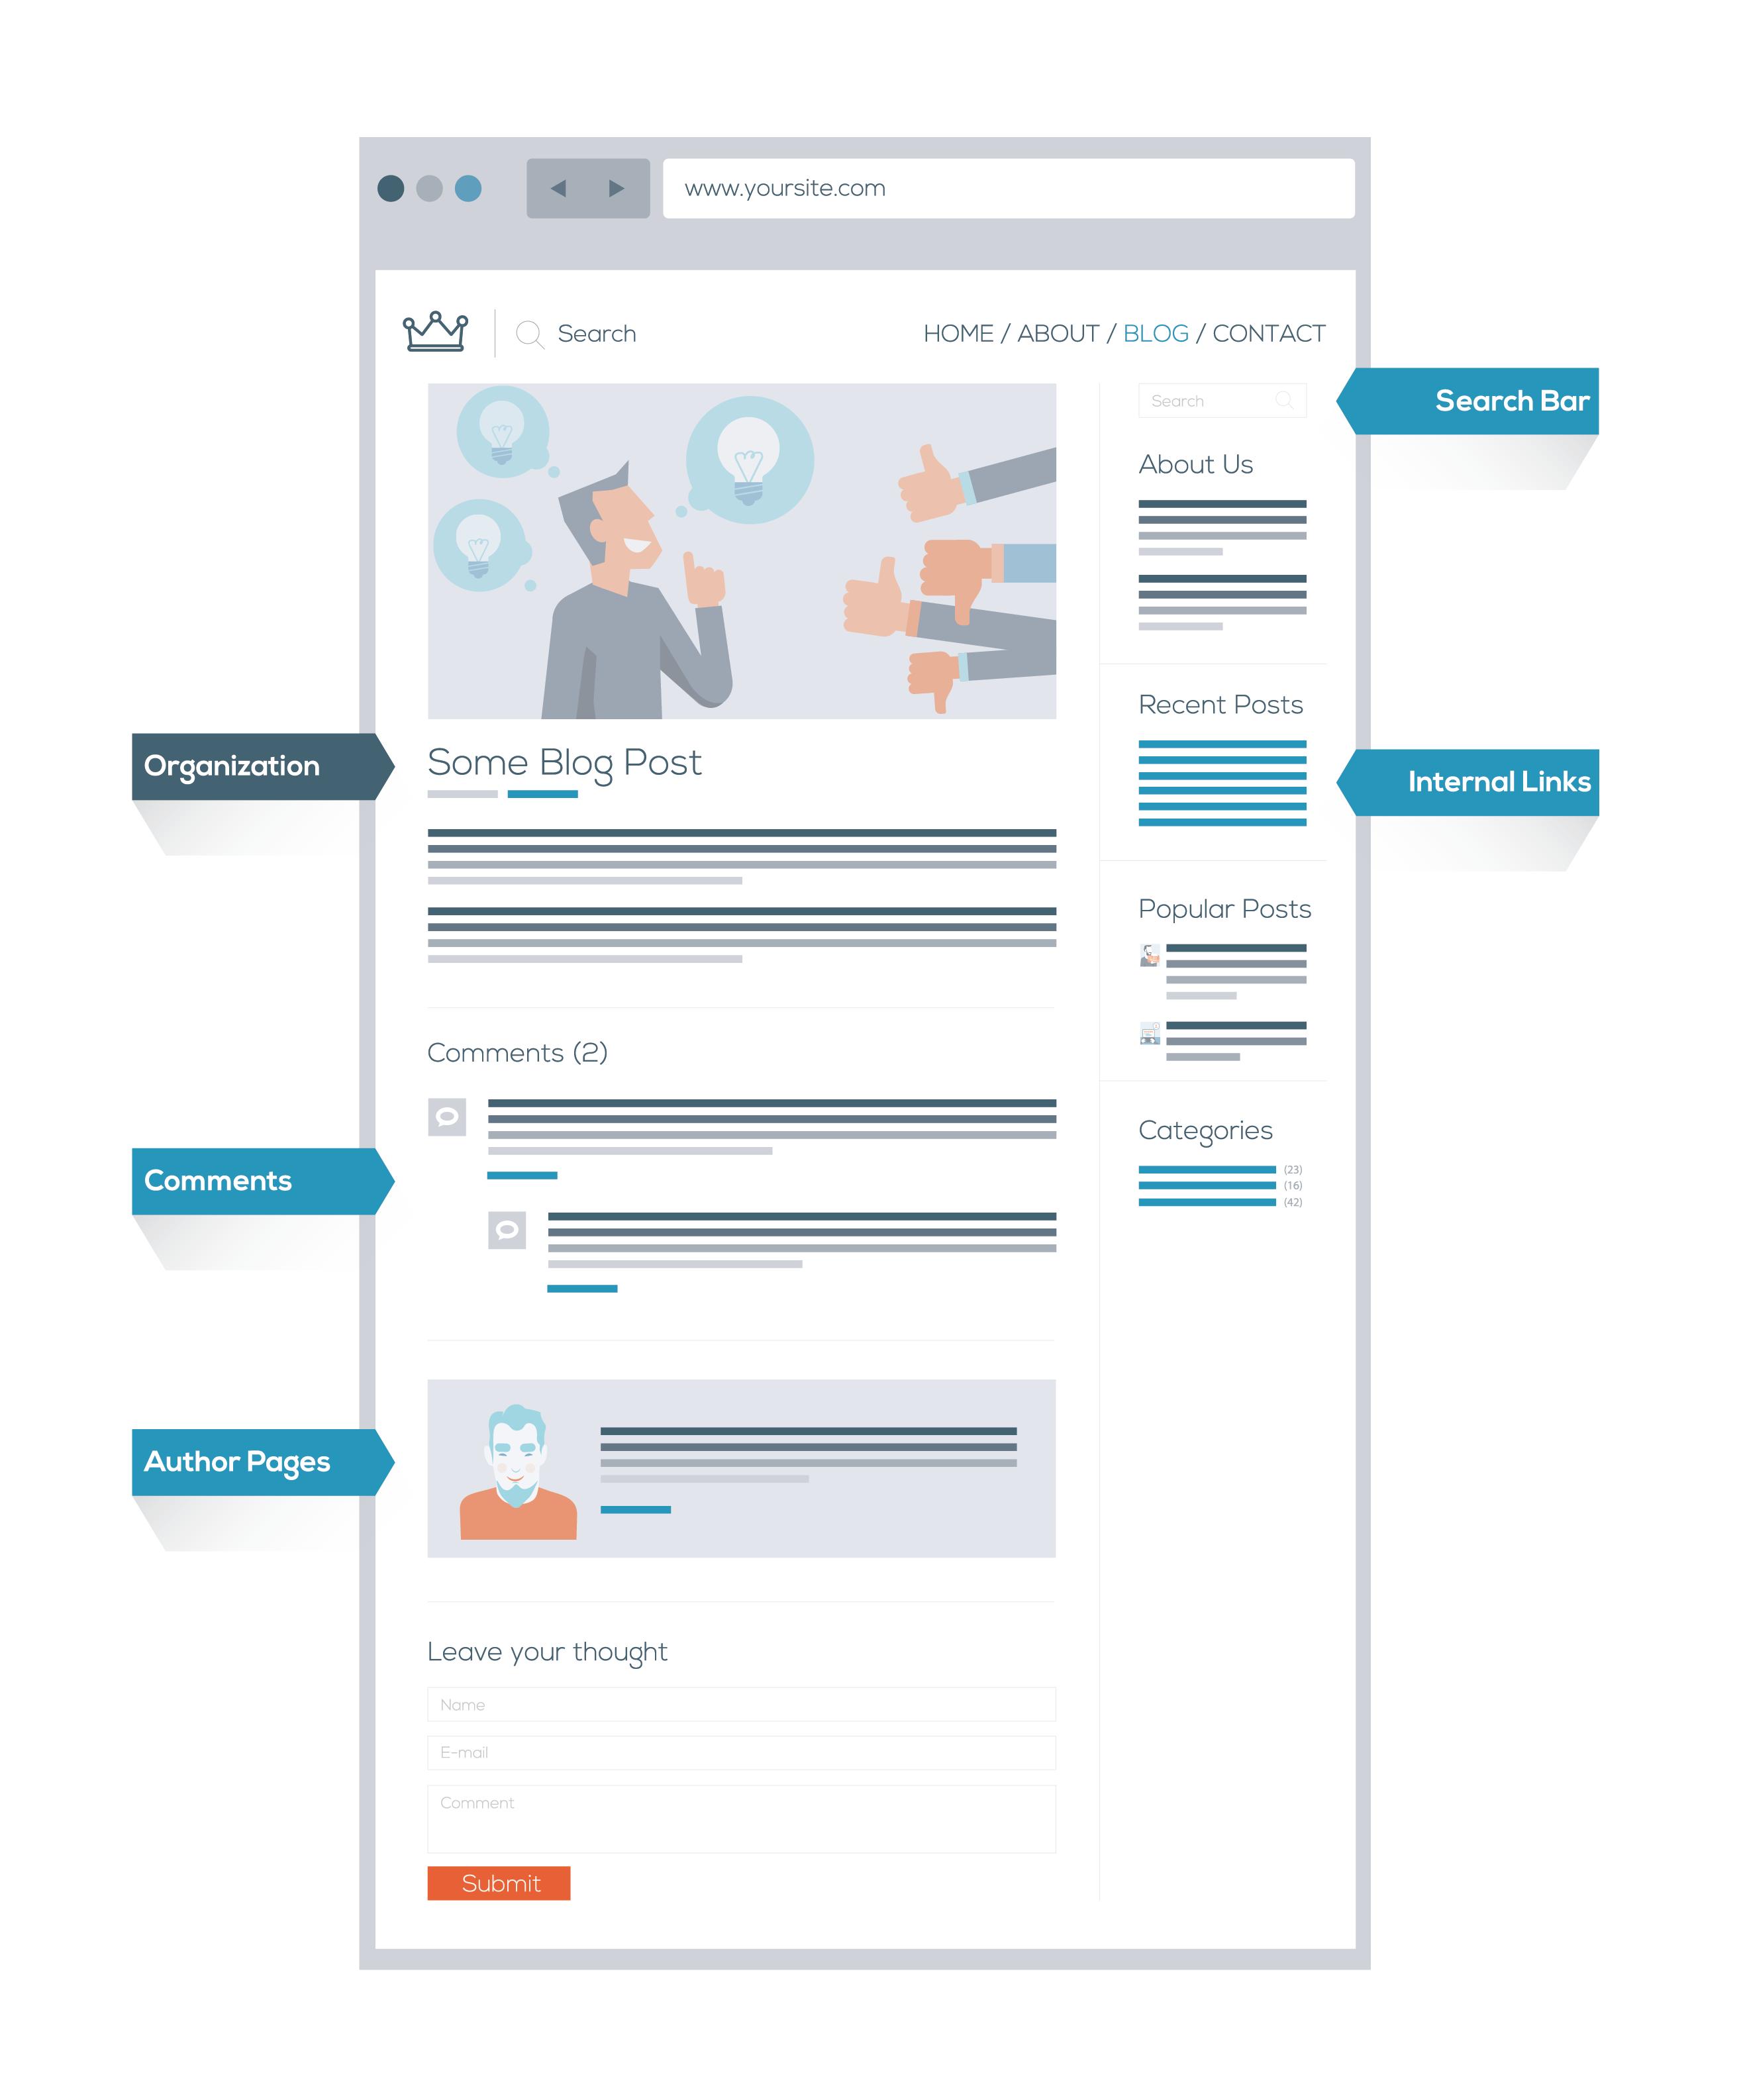 G2Crowd_Infographic_Blog